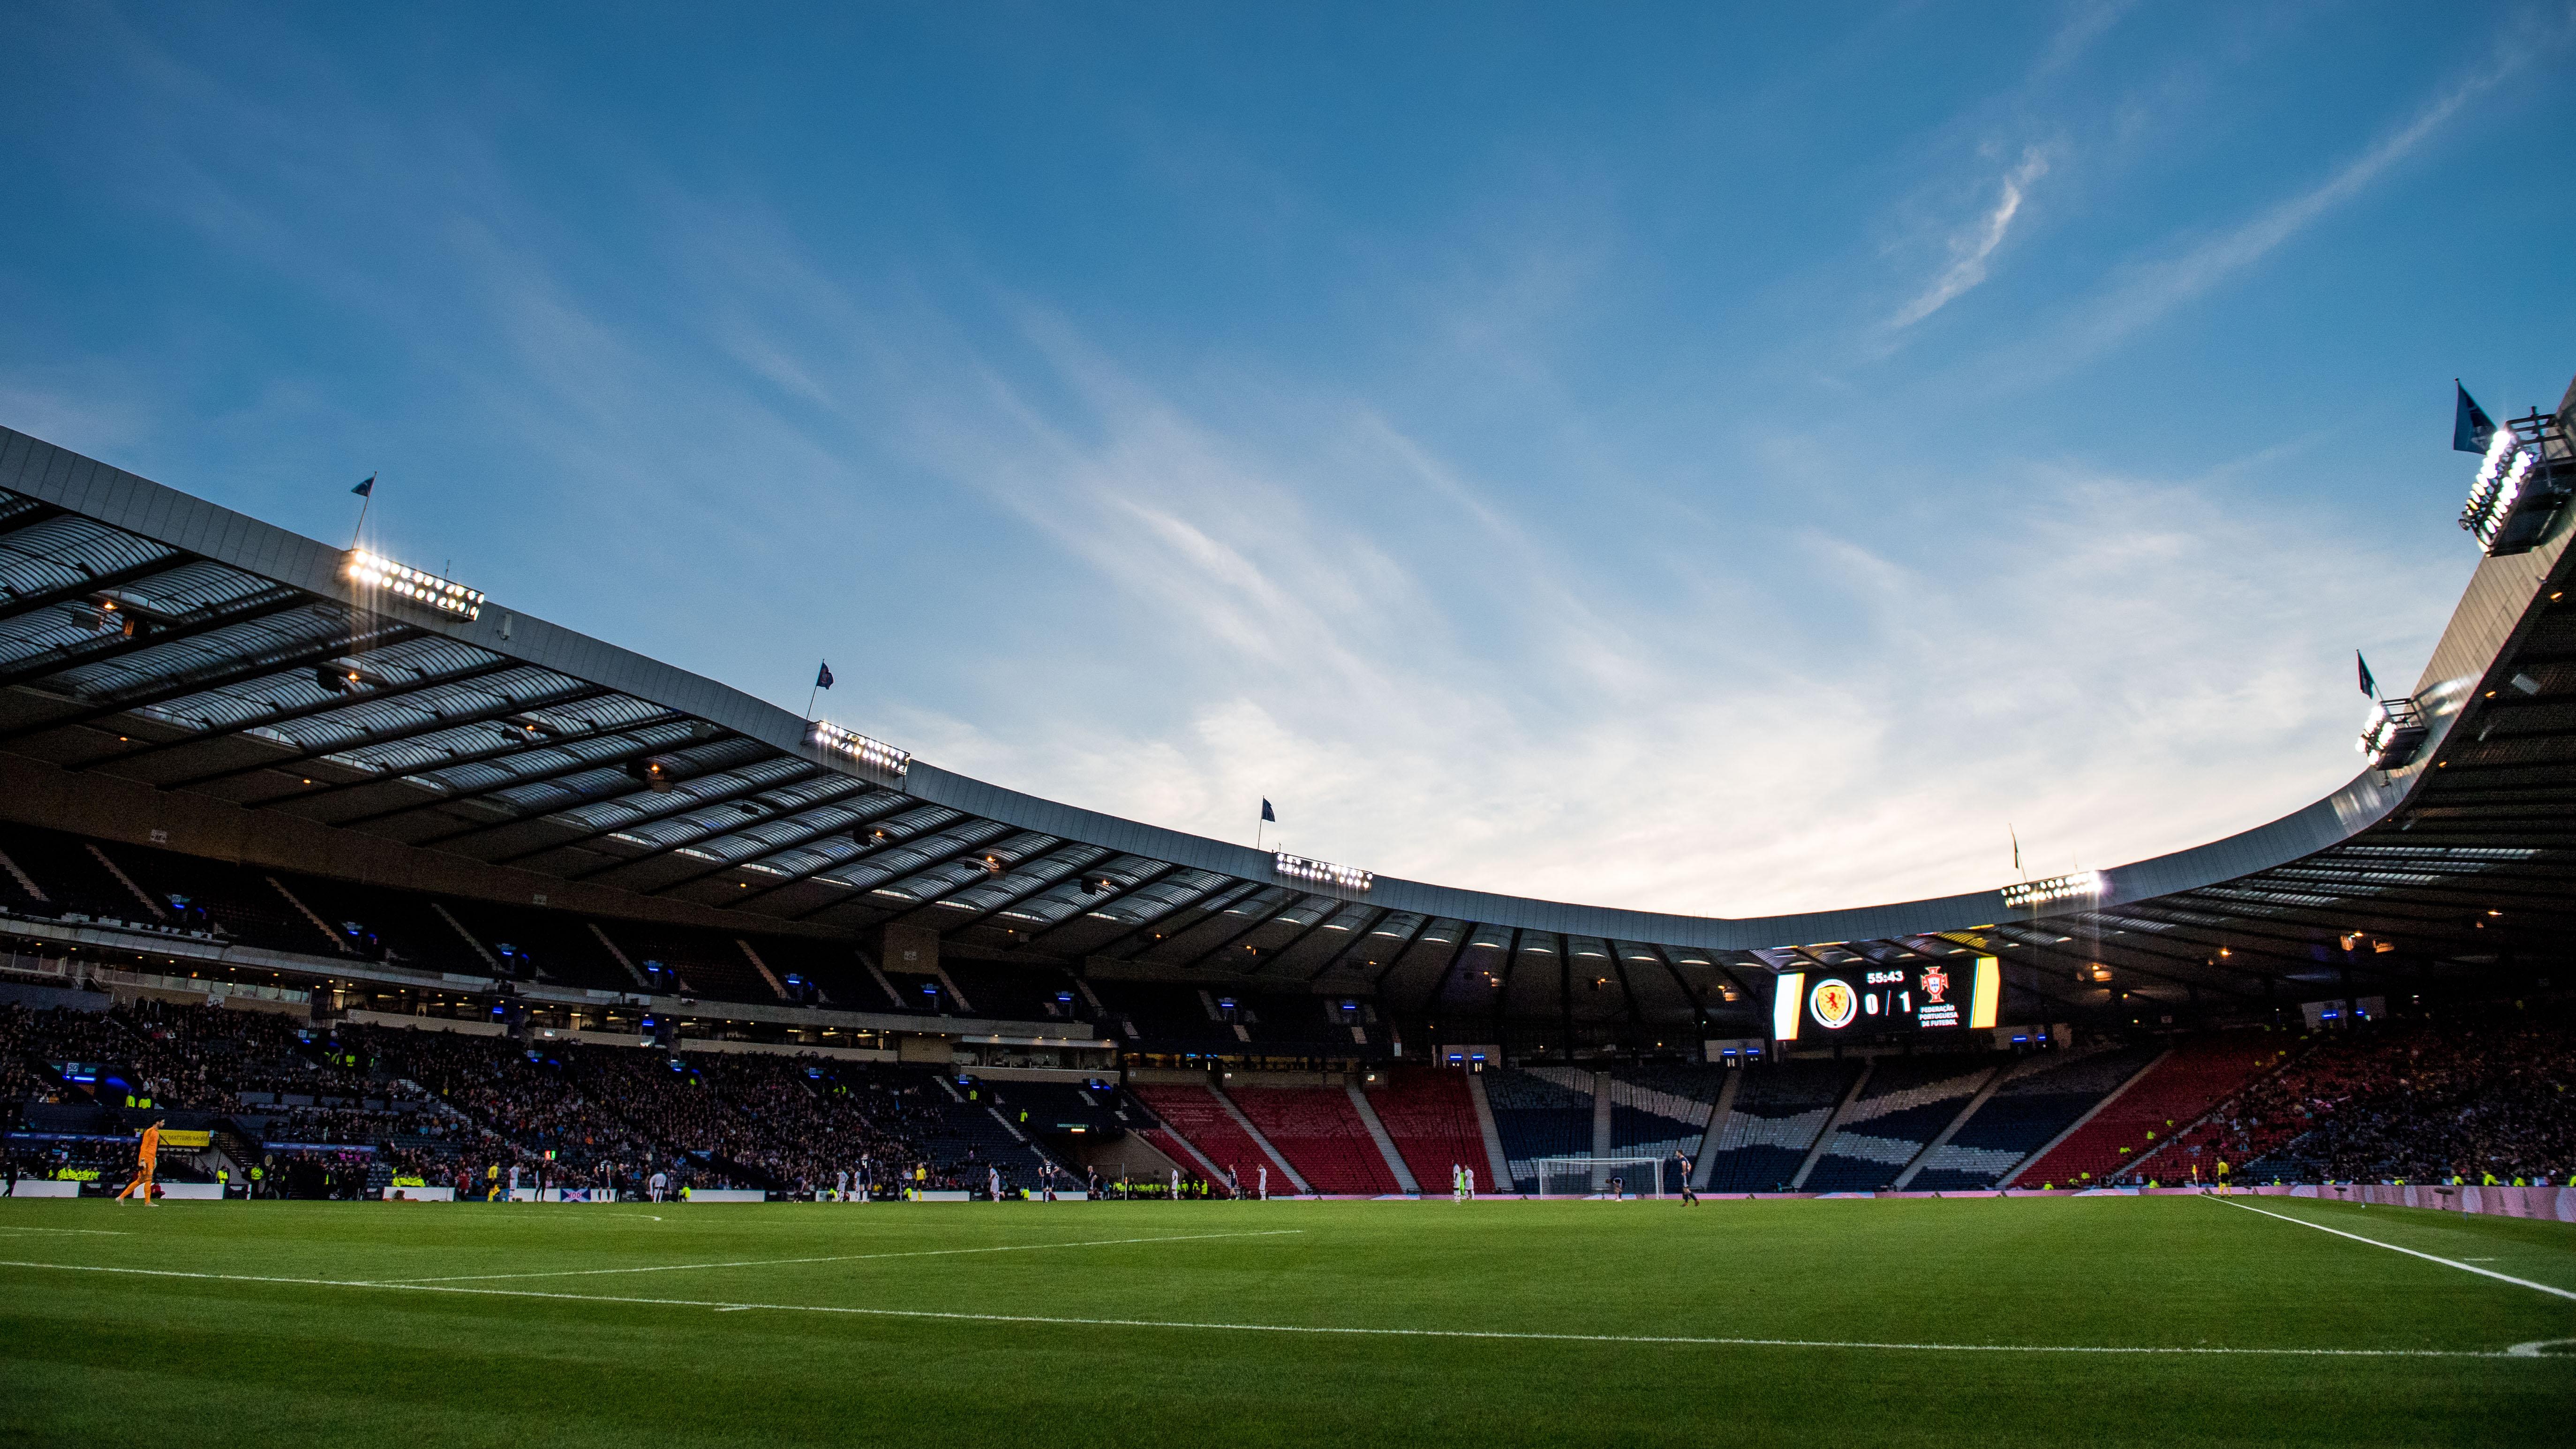 The home of Scottish football, Hampden Park